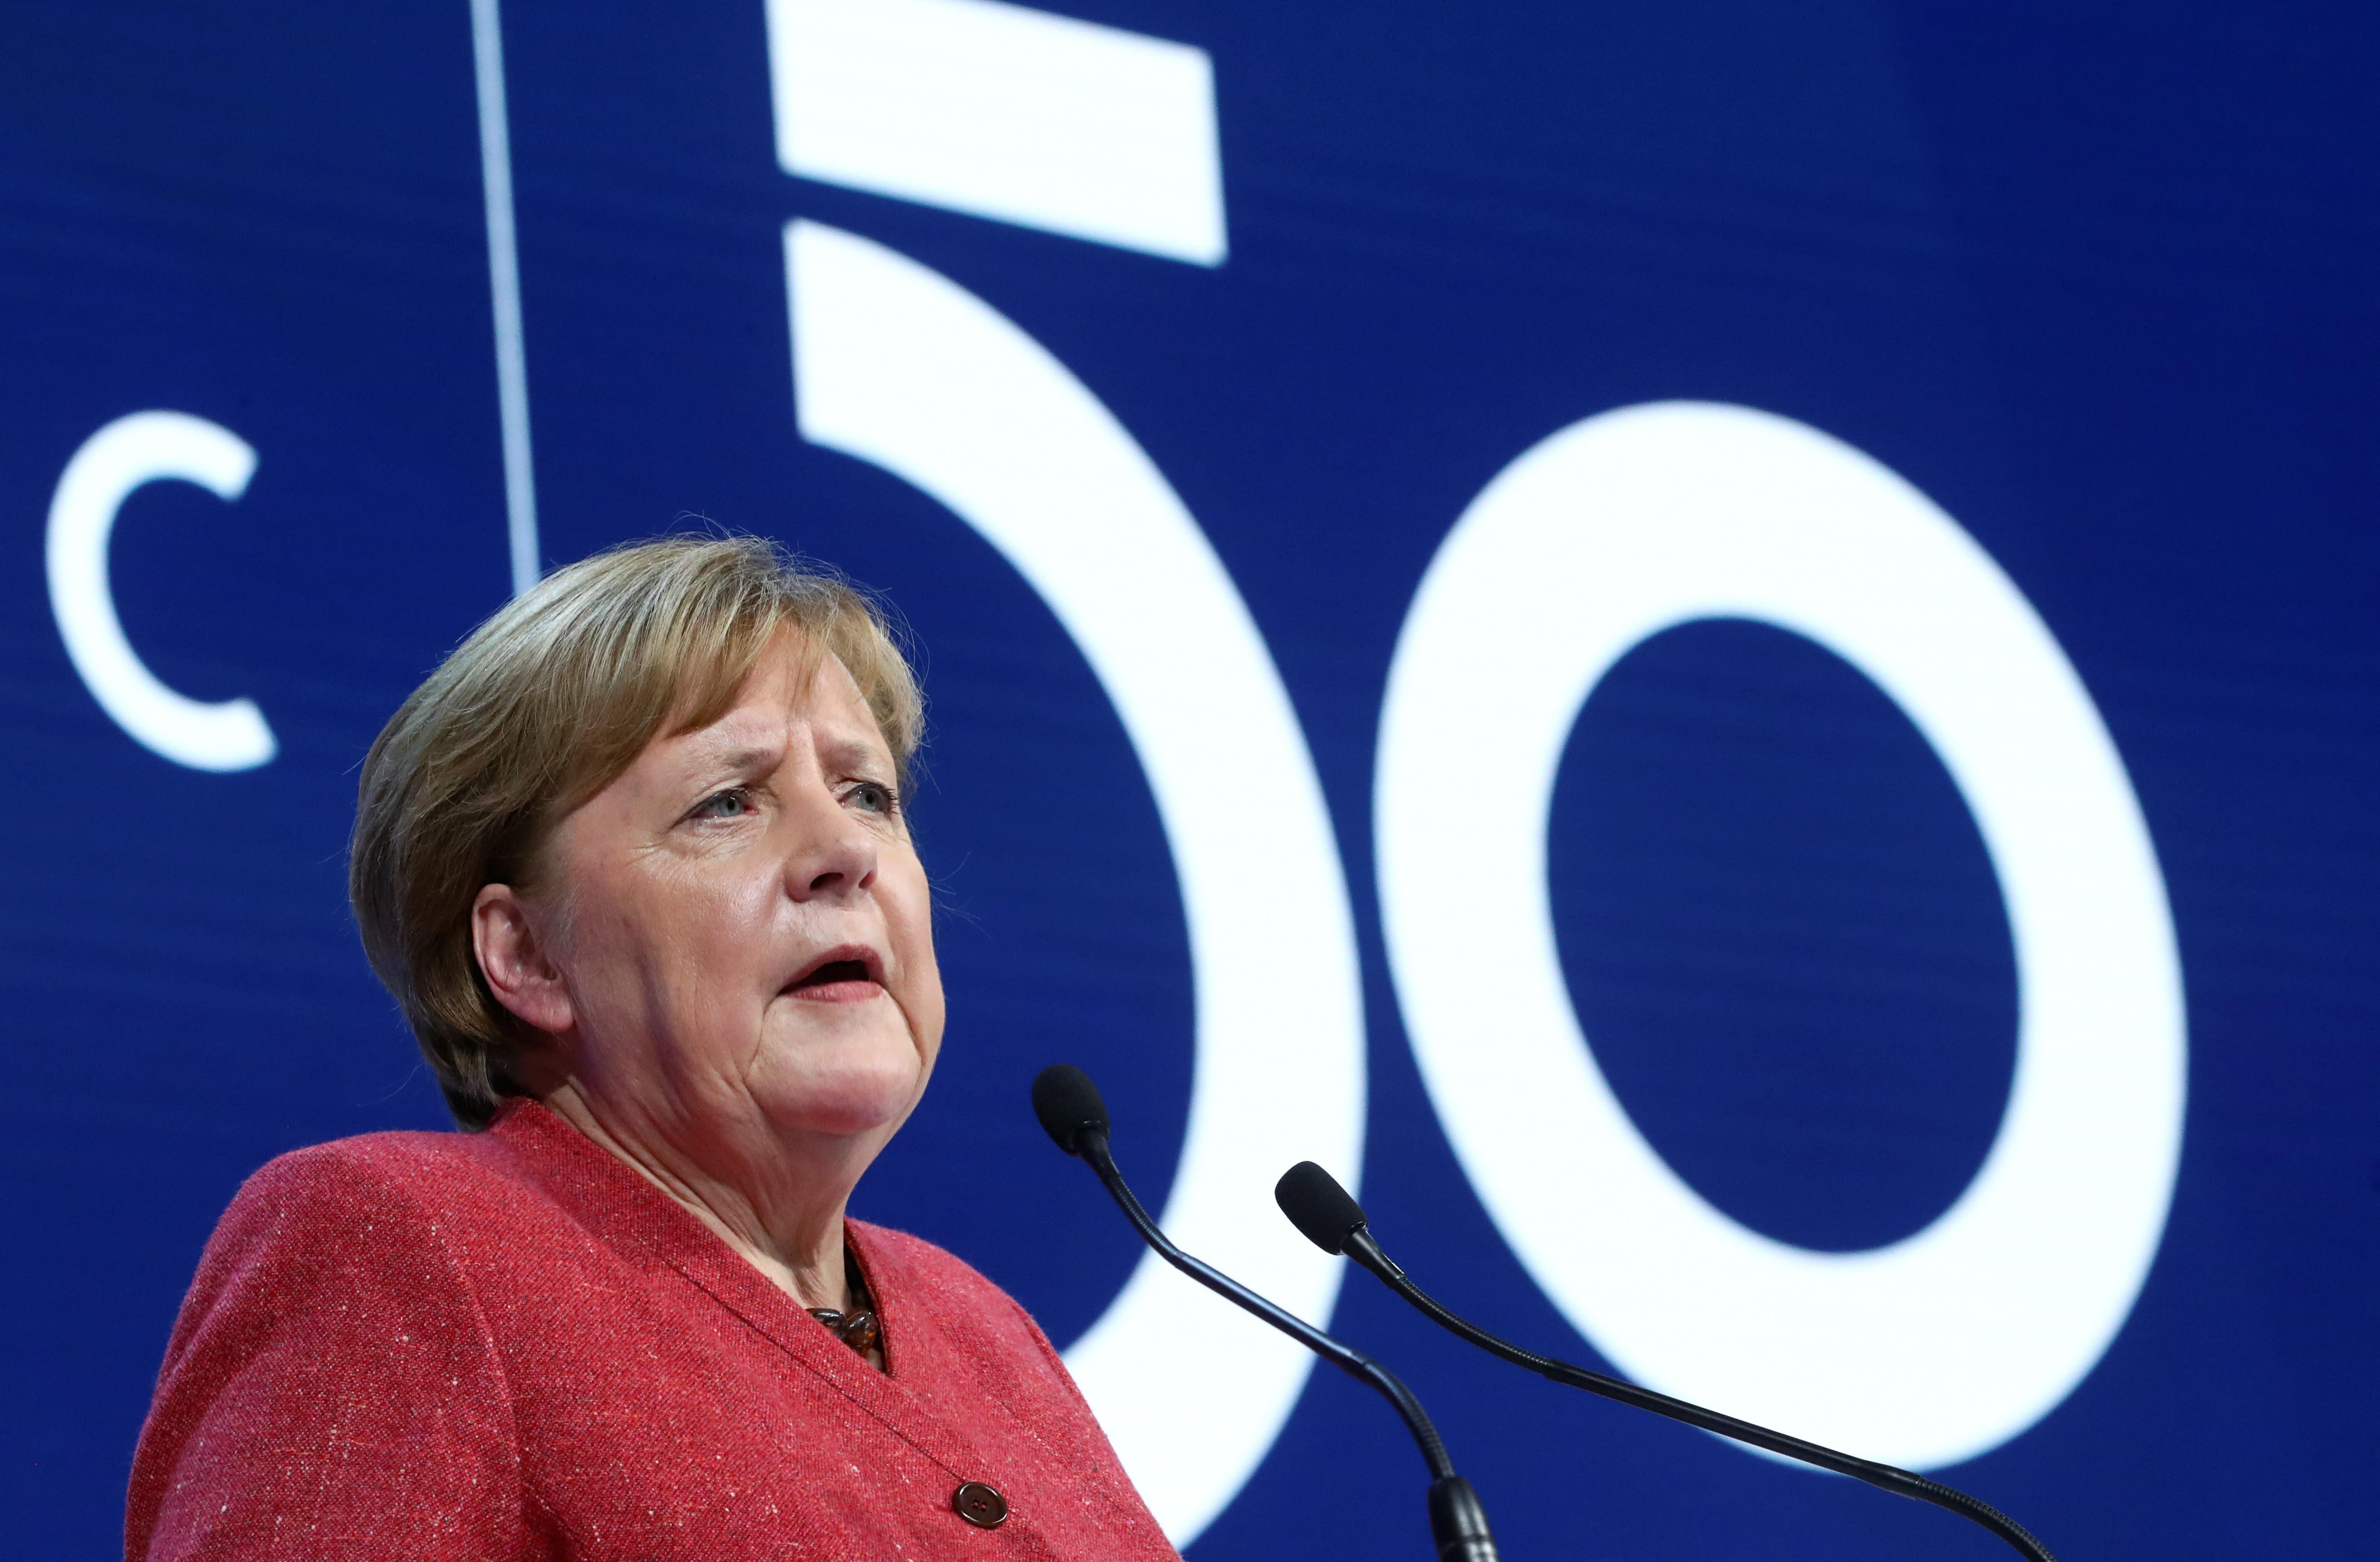 Our survival hinges on achieving Paris climate goals, Merkel tells Davos leaders